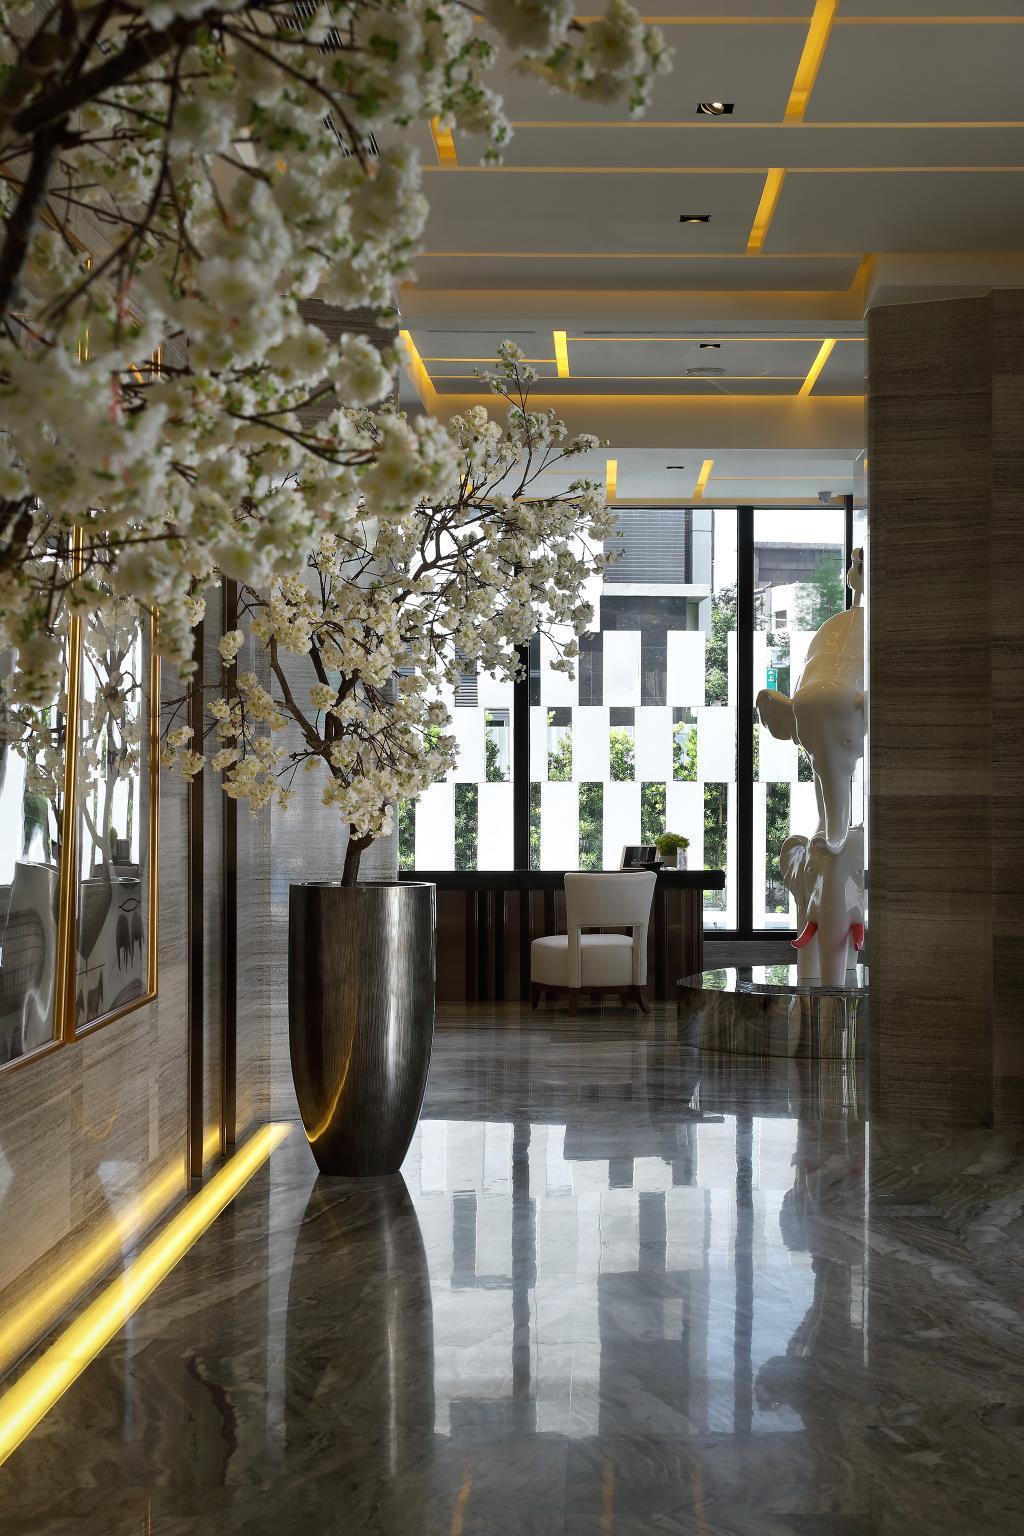 Boda Hotel Taichung Booking Agoda Com Best Price Guarantee